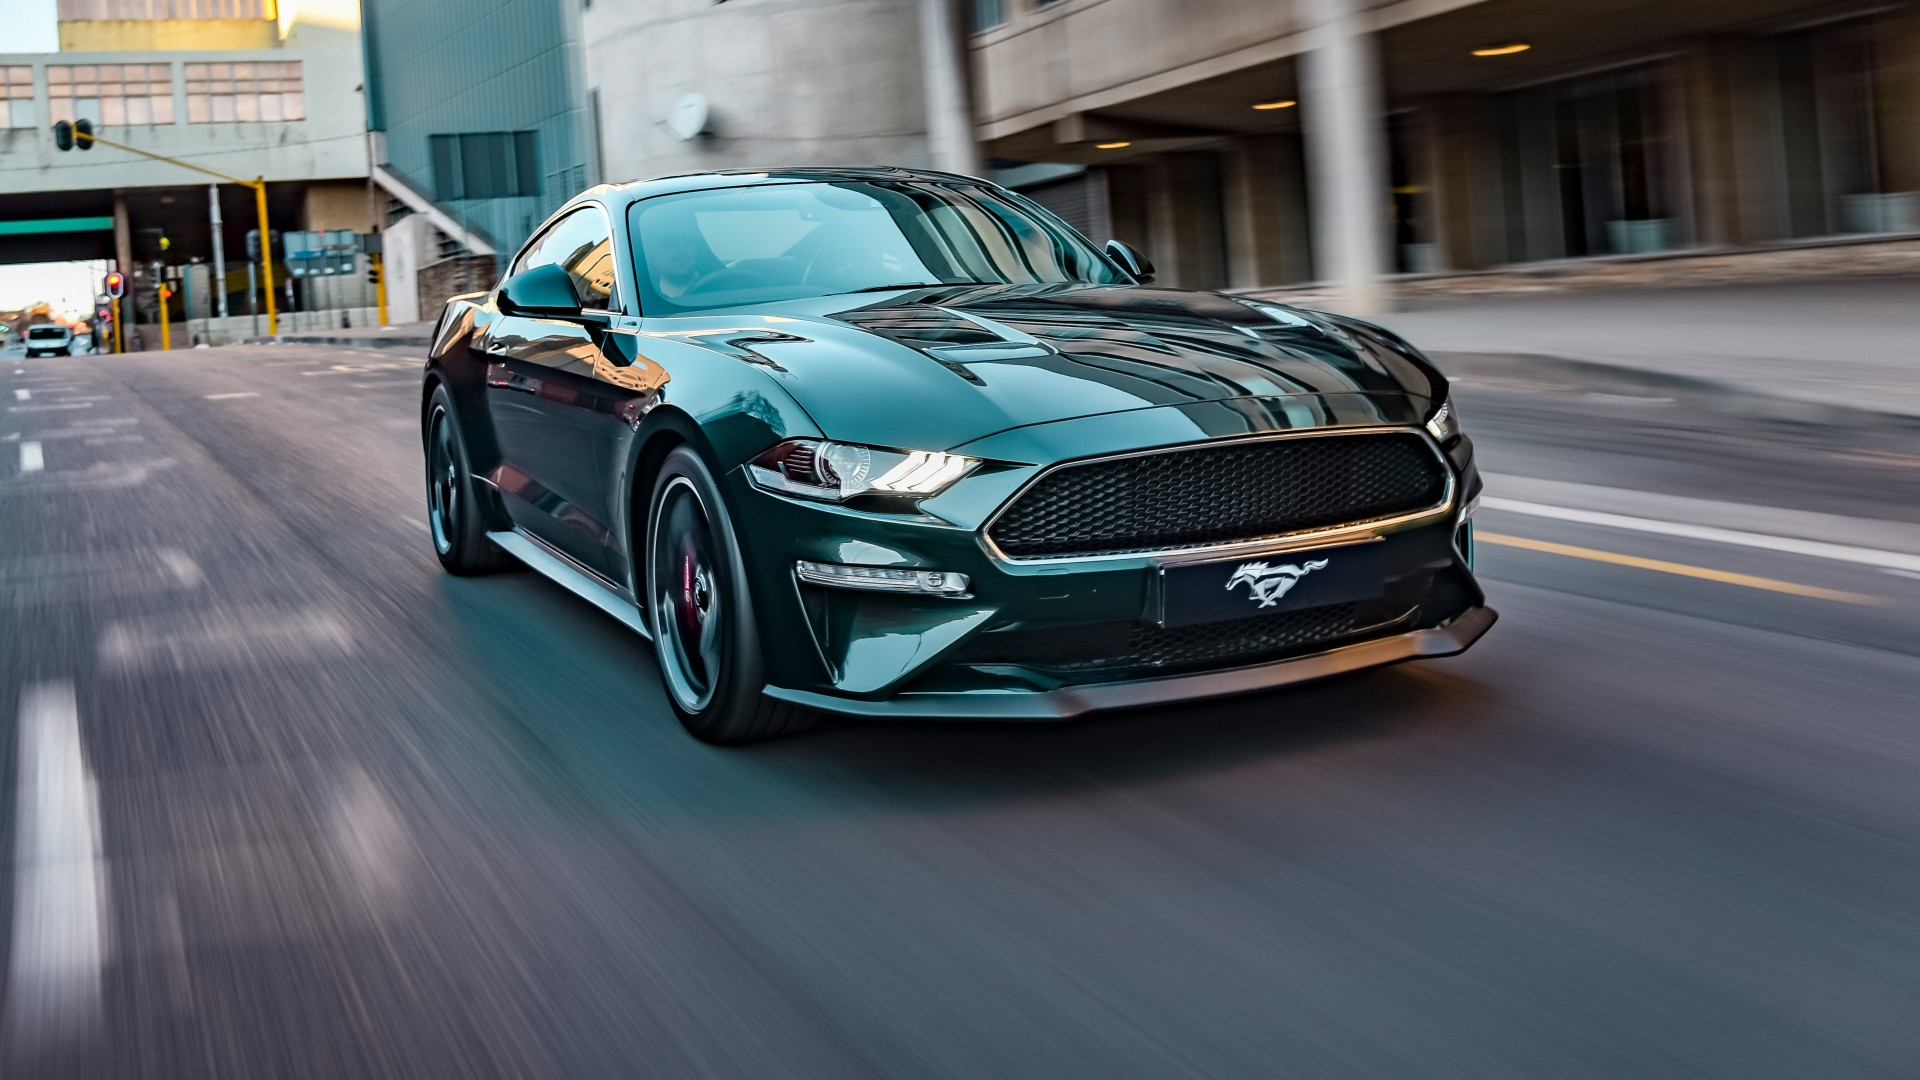 Ford Mustang Bullitt 2019 4k 7 Wallpaper Hd Car